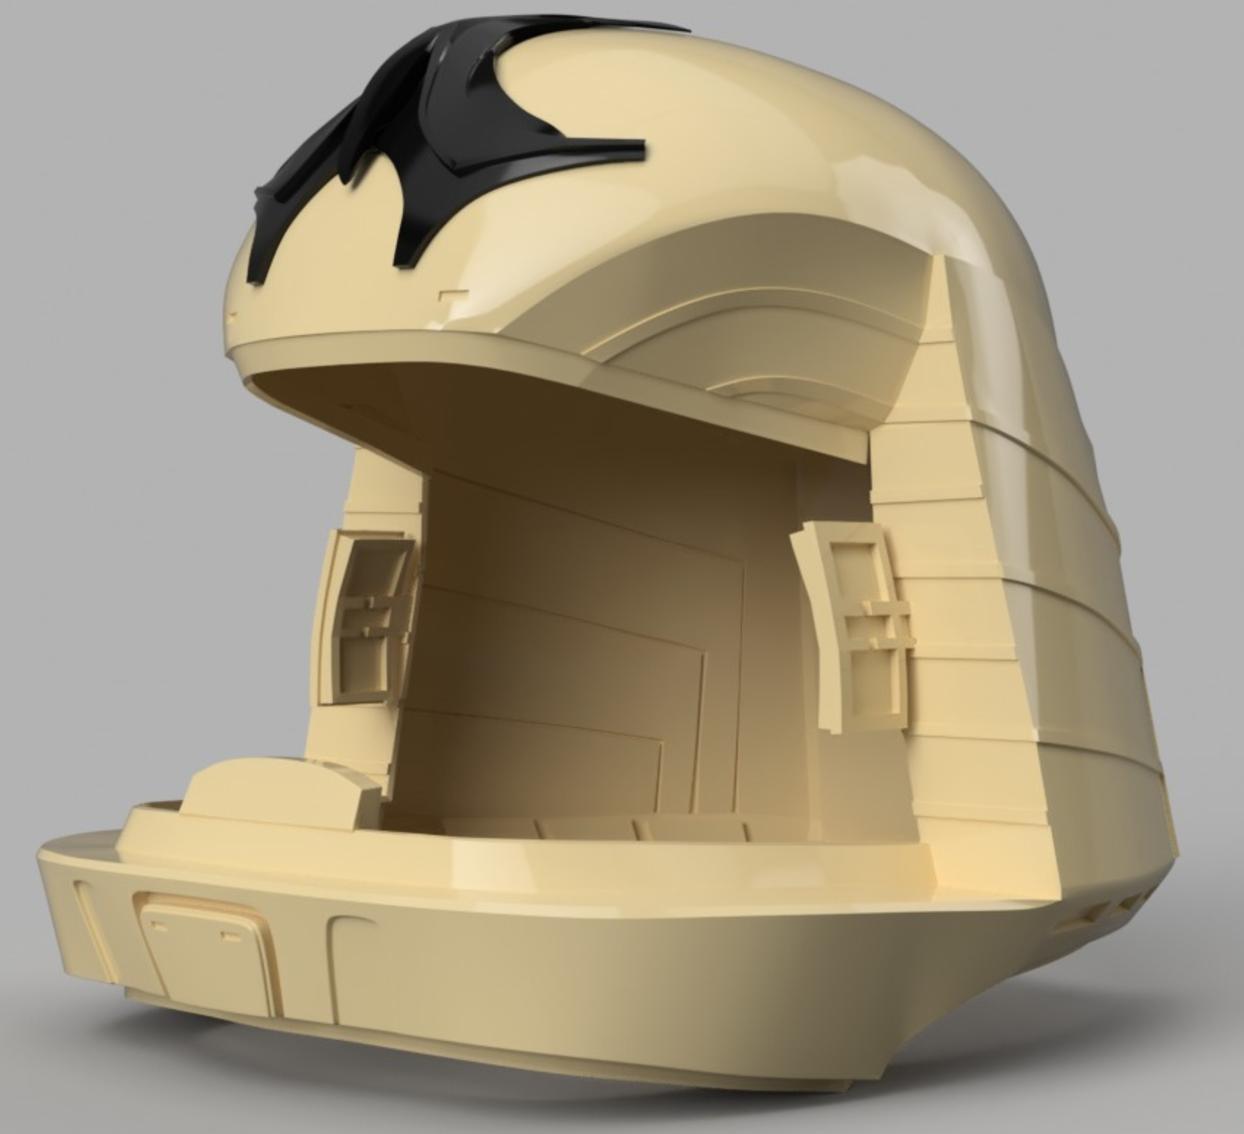 Capture d'écran 2017-09-15 à 16.16.15.png Download free STL file Battlestar Galactica Colonial Viper Pilot Helmet • 3D printing object, VillainousPropShop